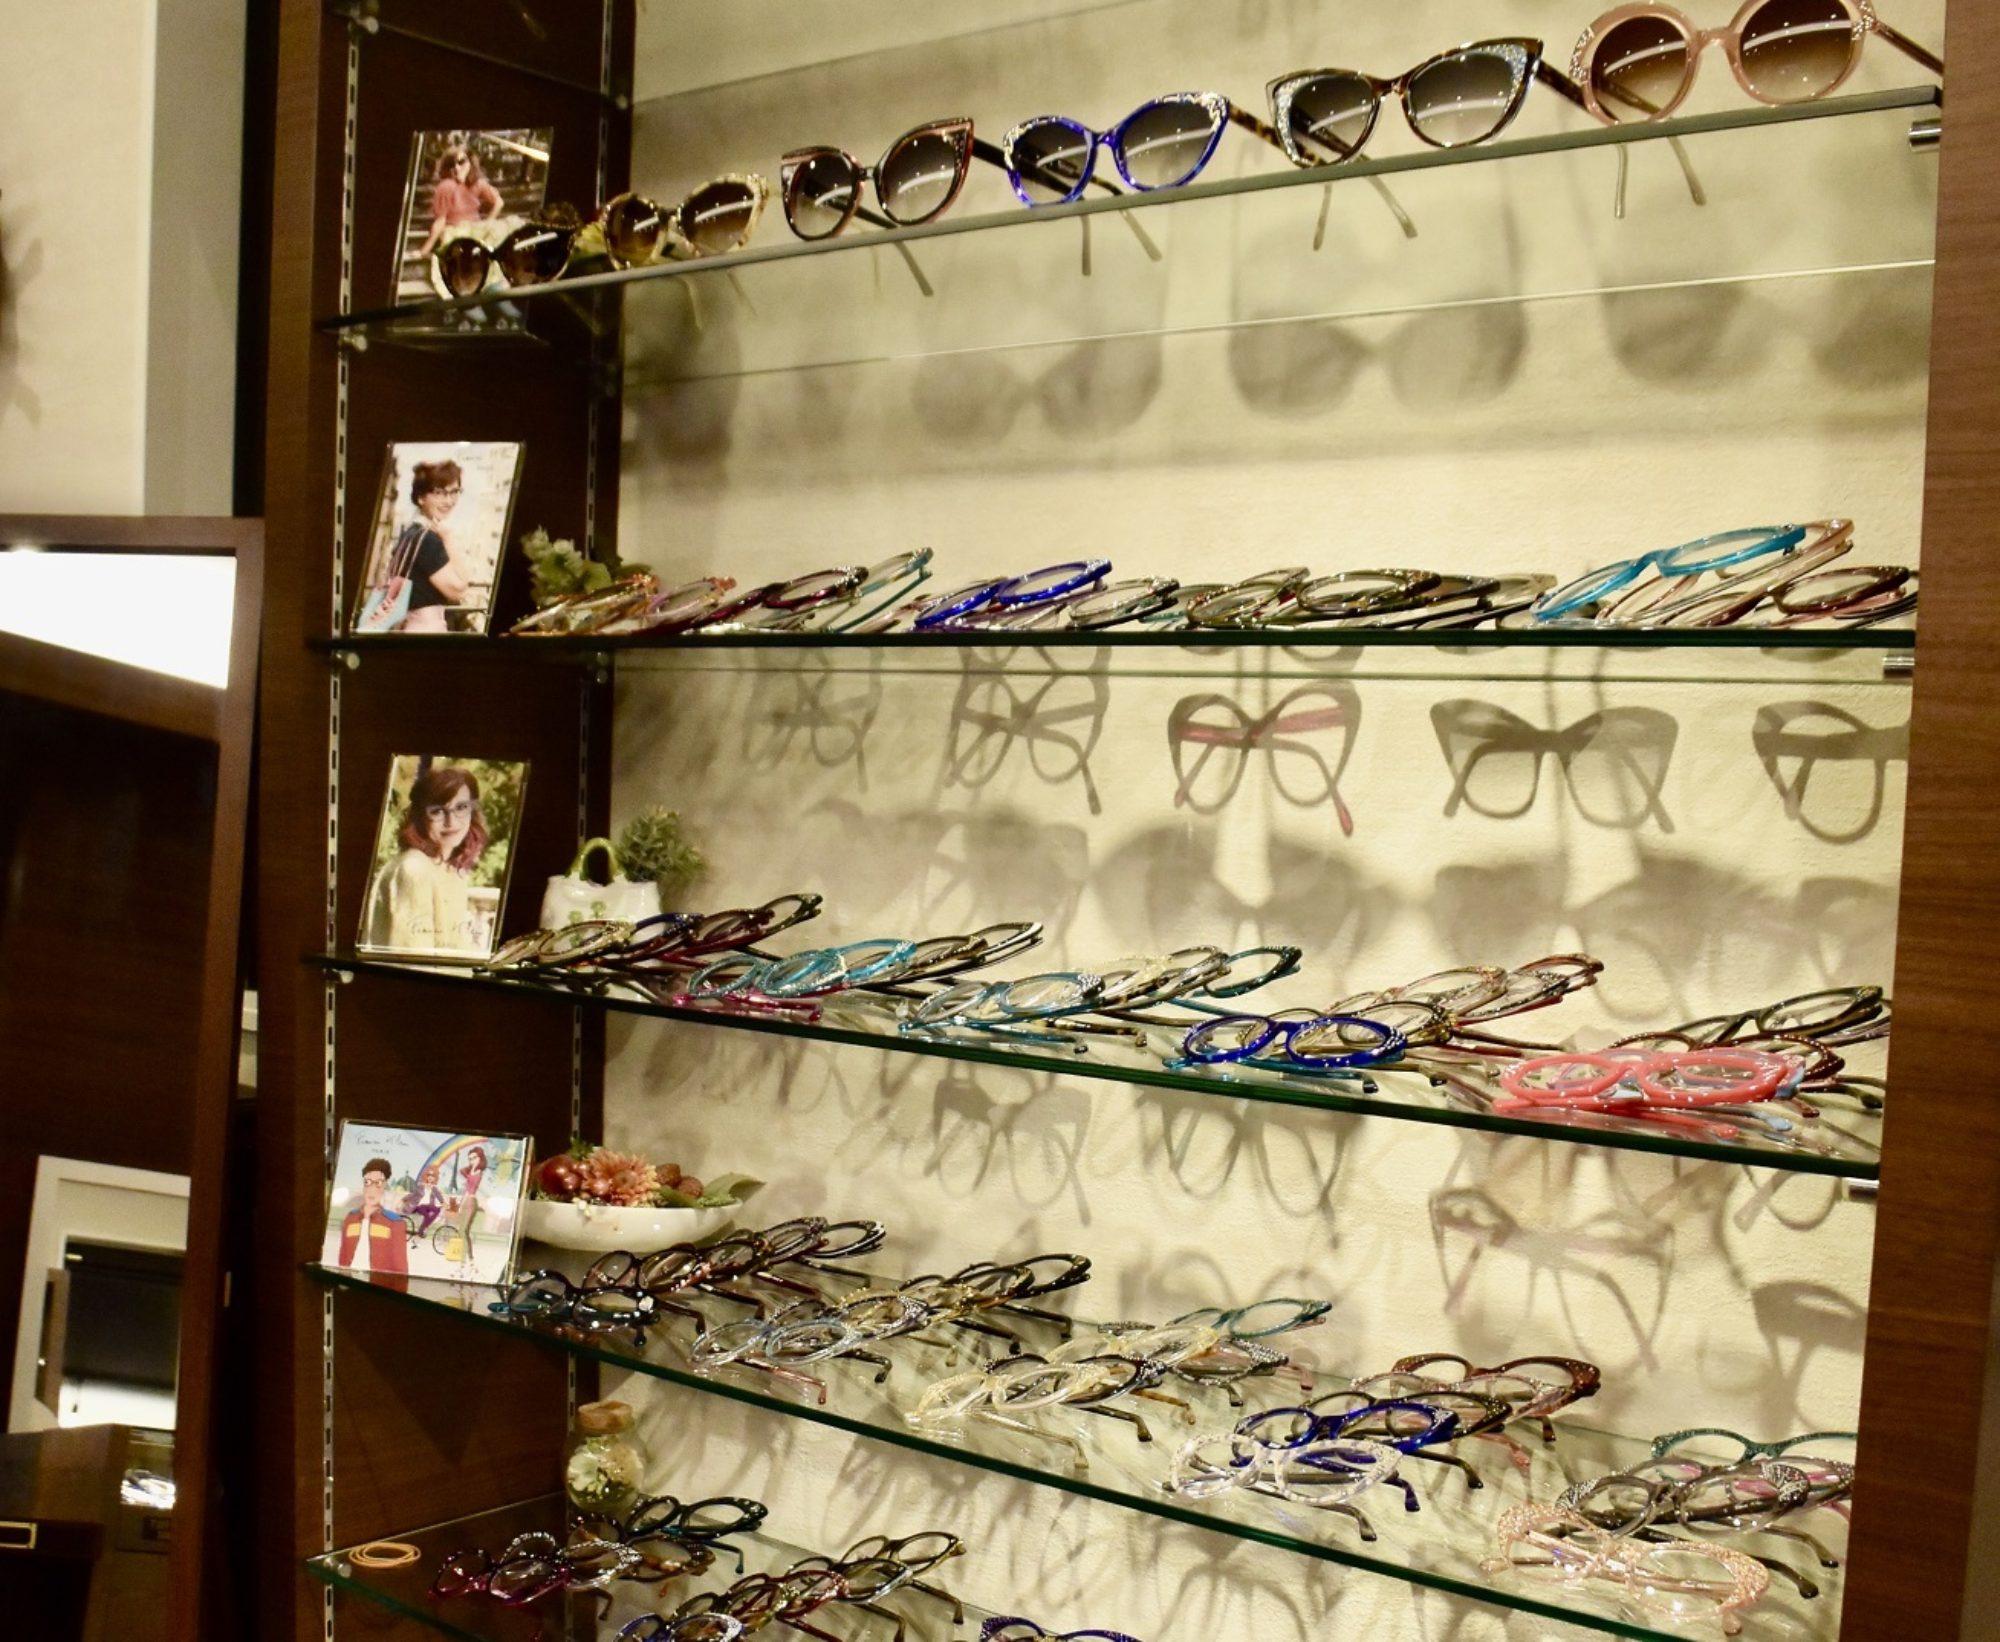 Eyewear Effect | 静岡県浜松市のアイウェアショップ エフェクト